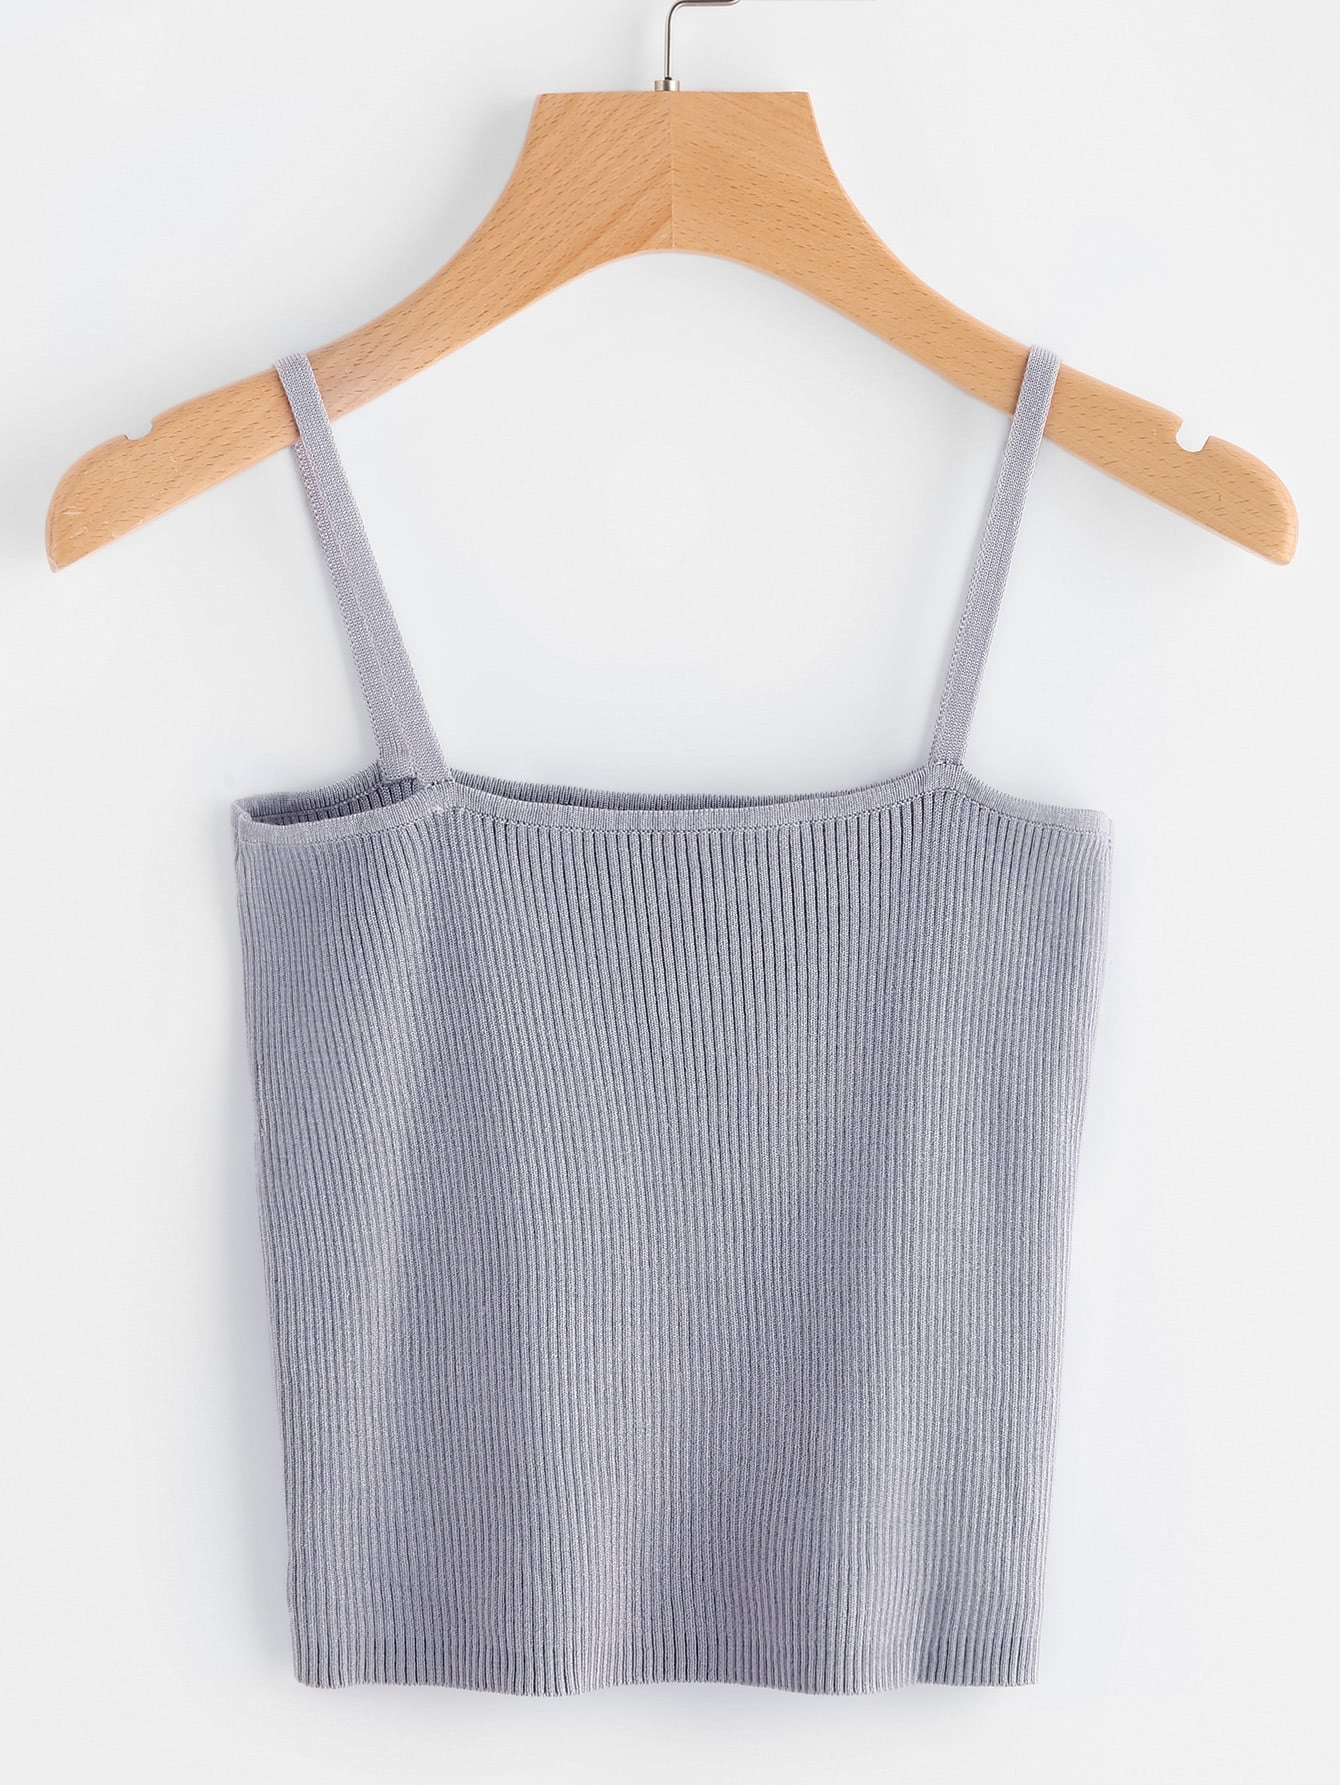 Rib Knit Crop Cami Top vest170418452